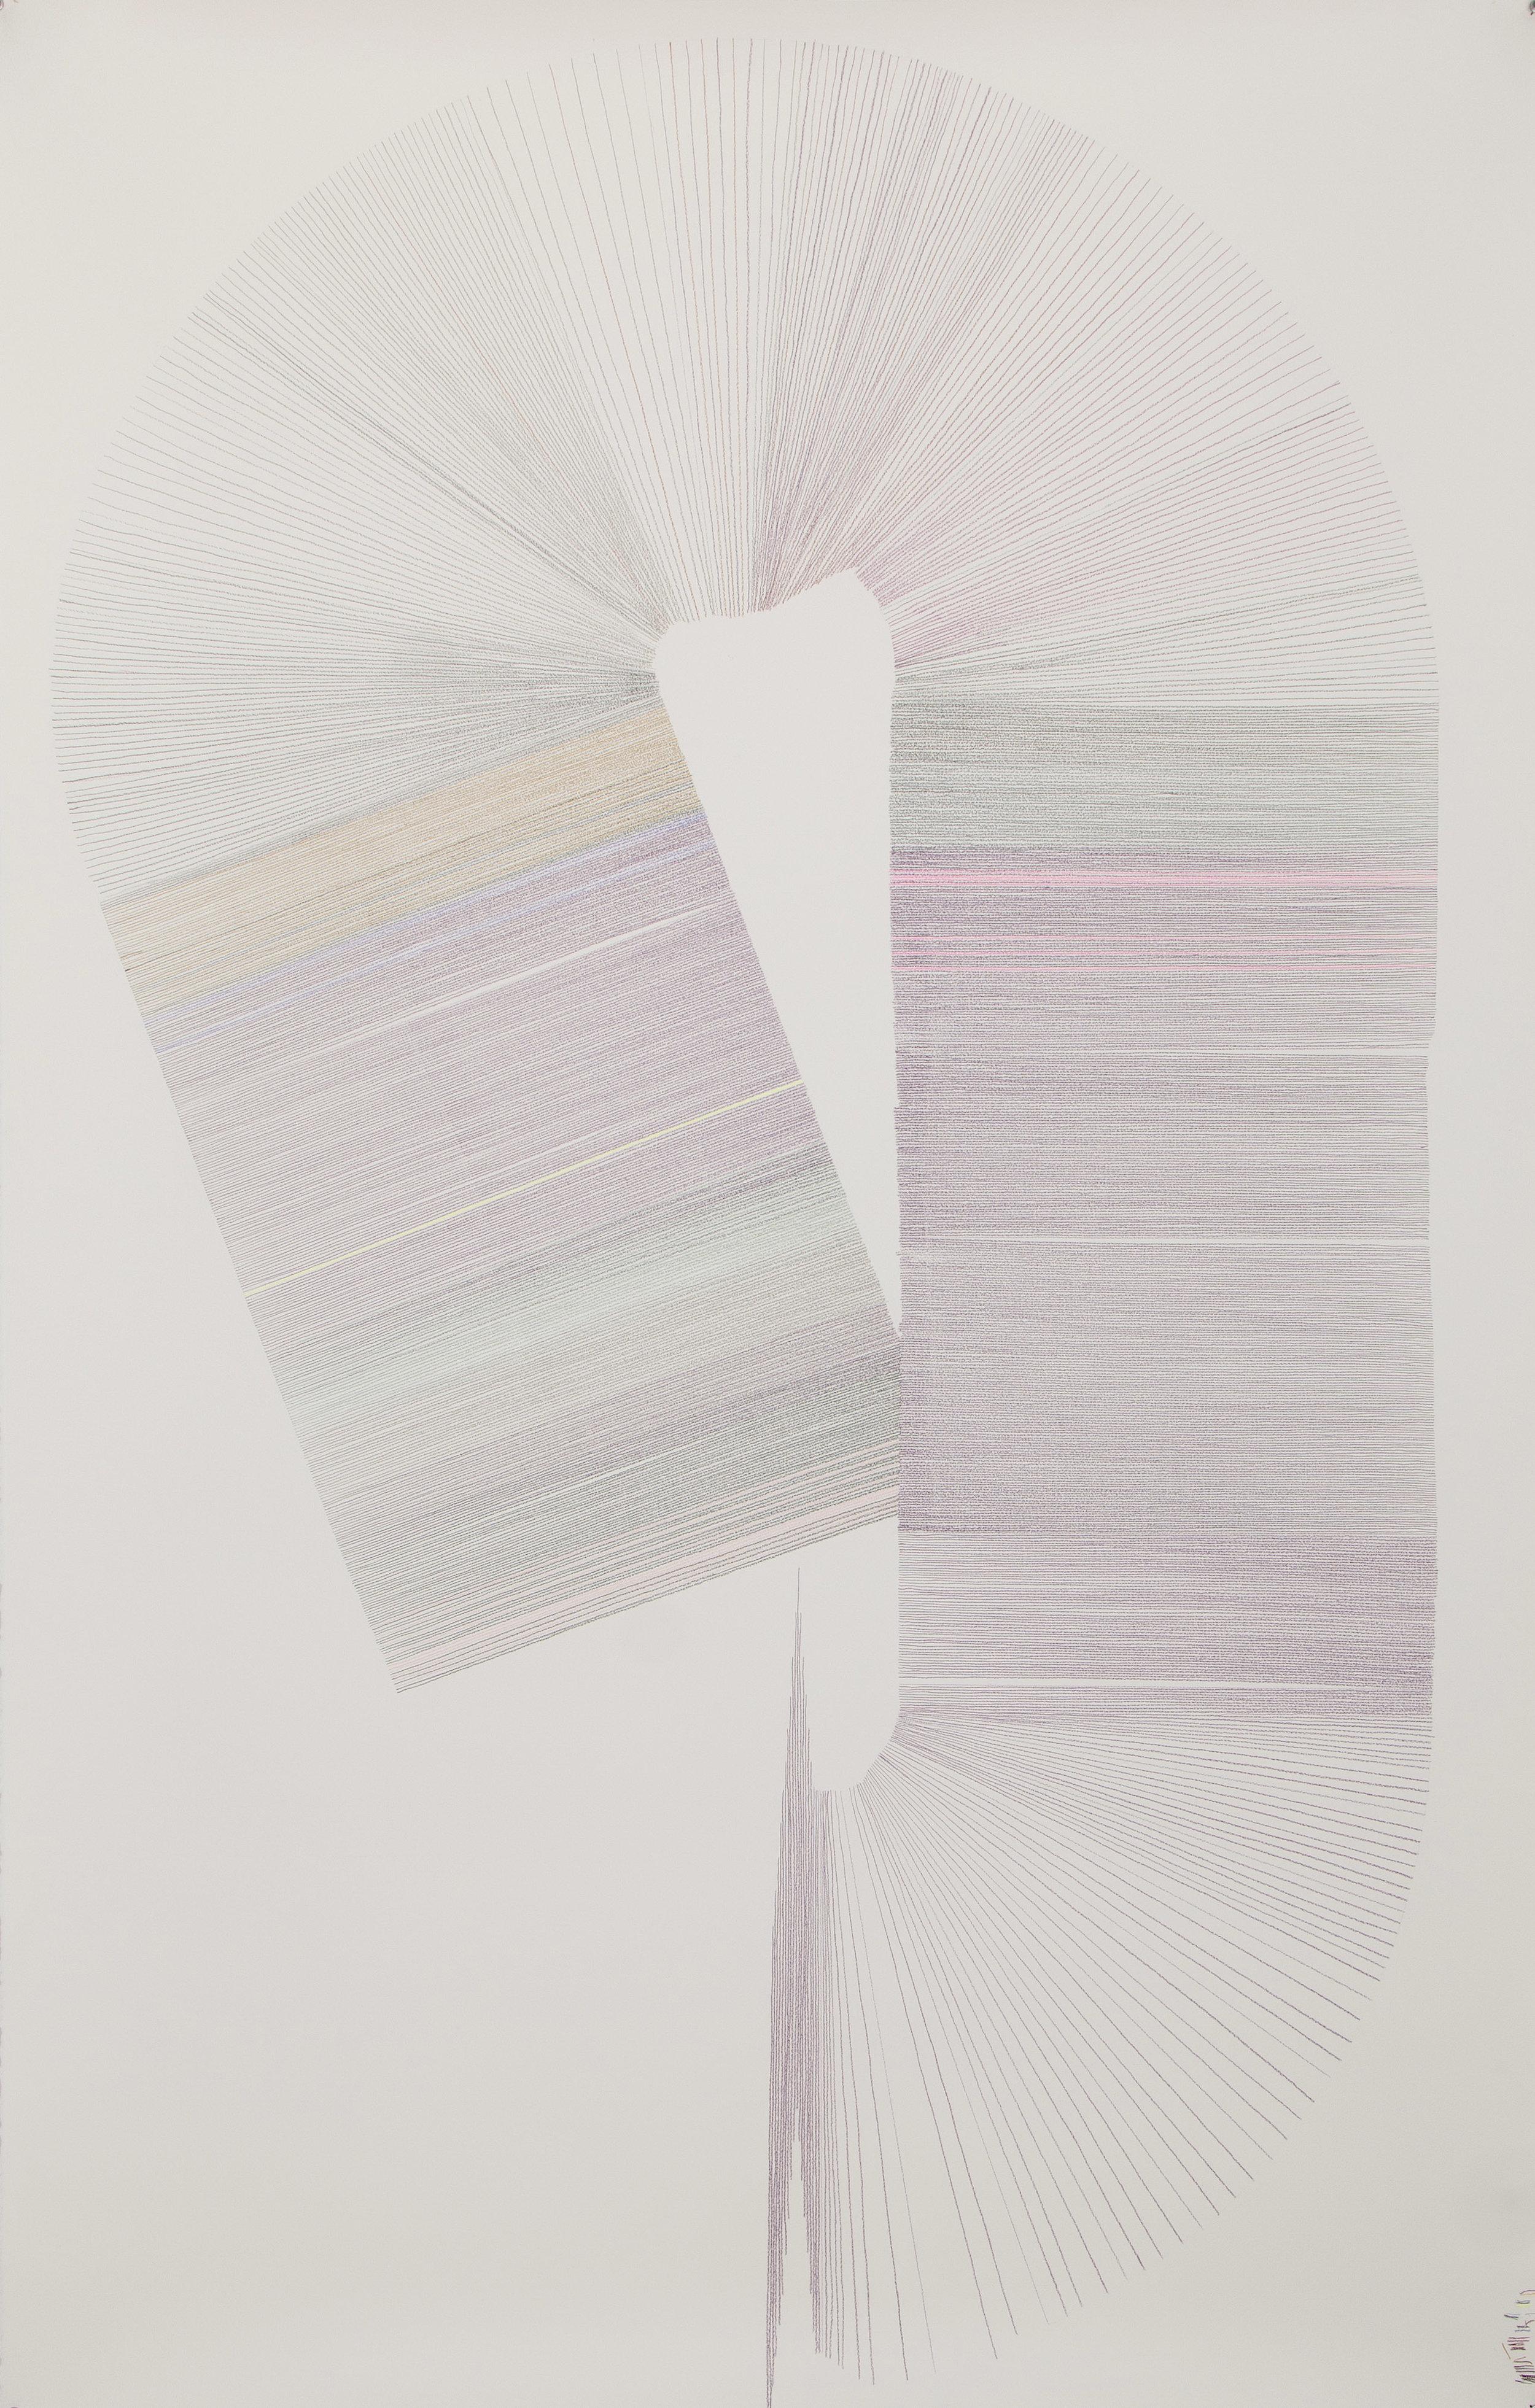 "Ernesto Garcia Sanchez, Untitled, 2018, 71"" x 44"" Crayon on Arches Paper"